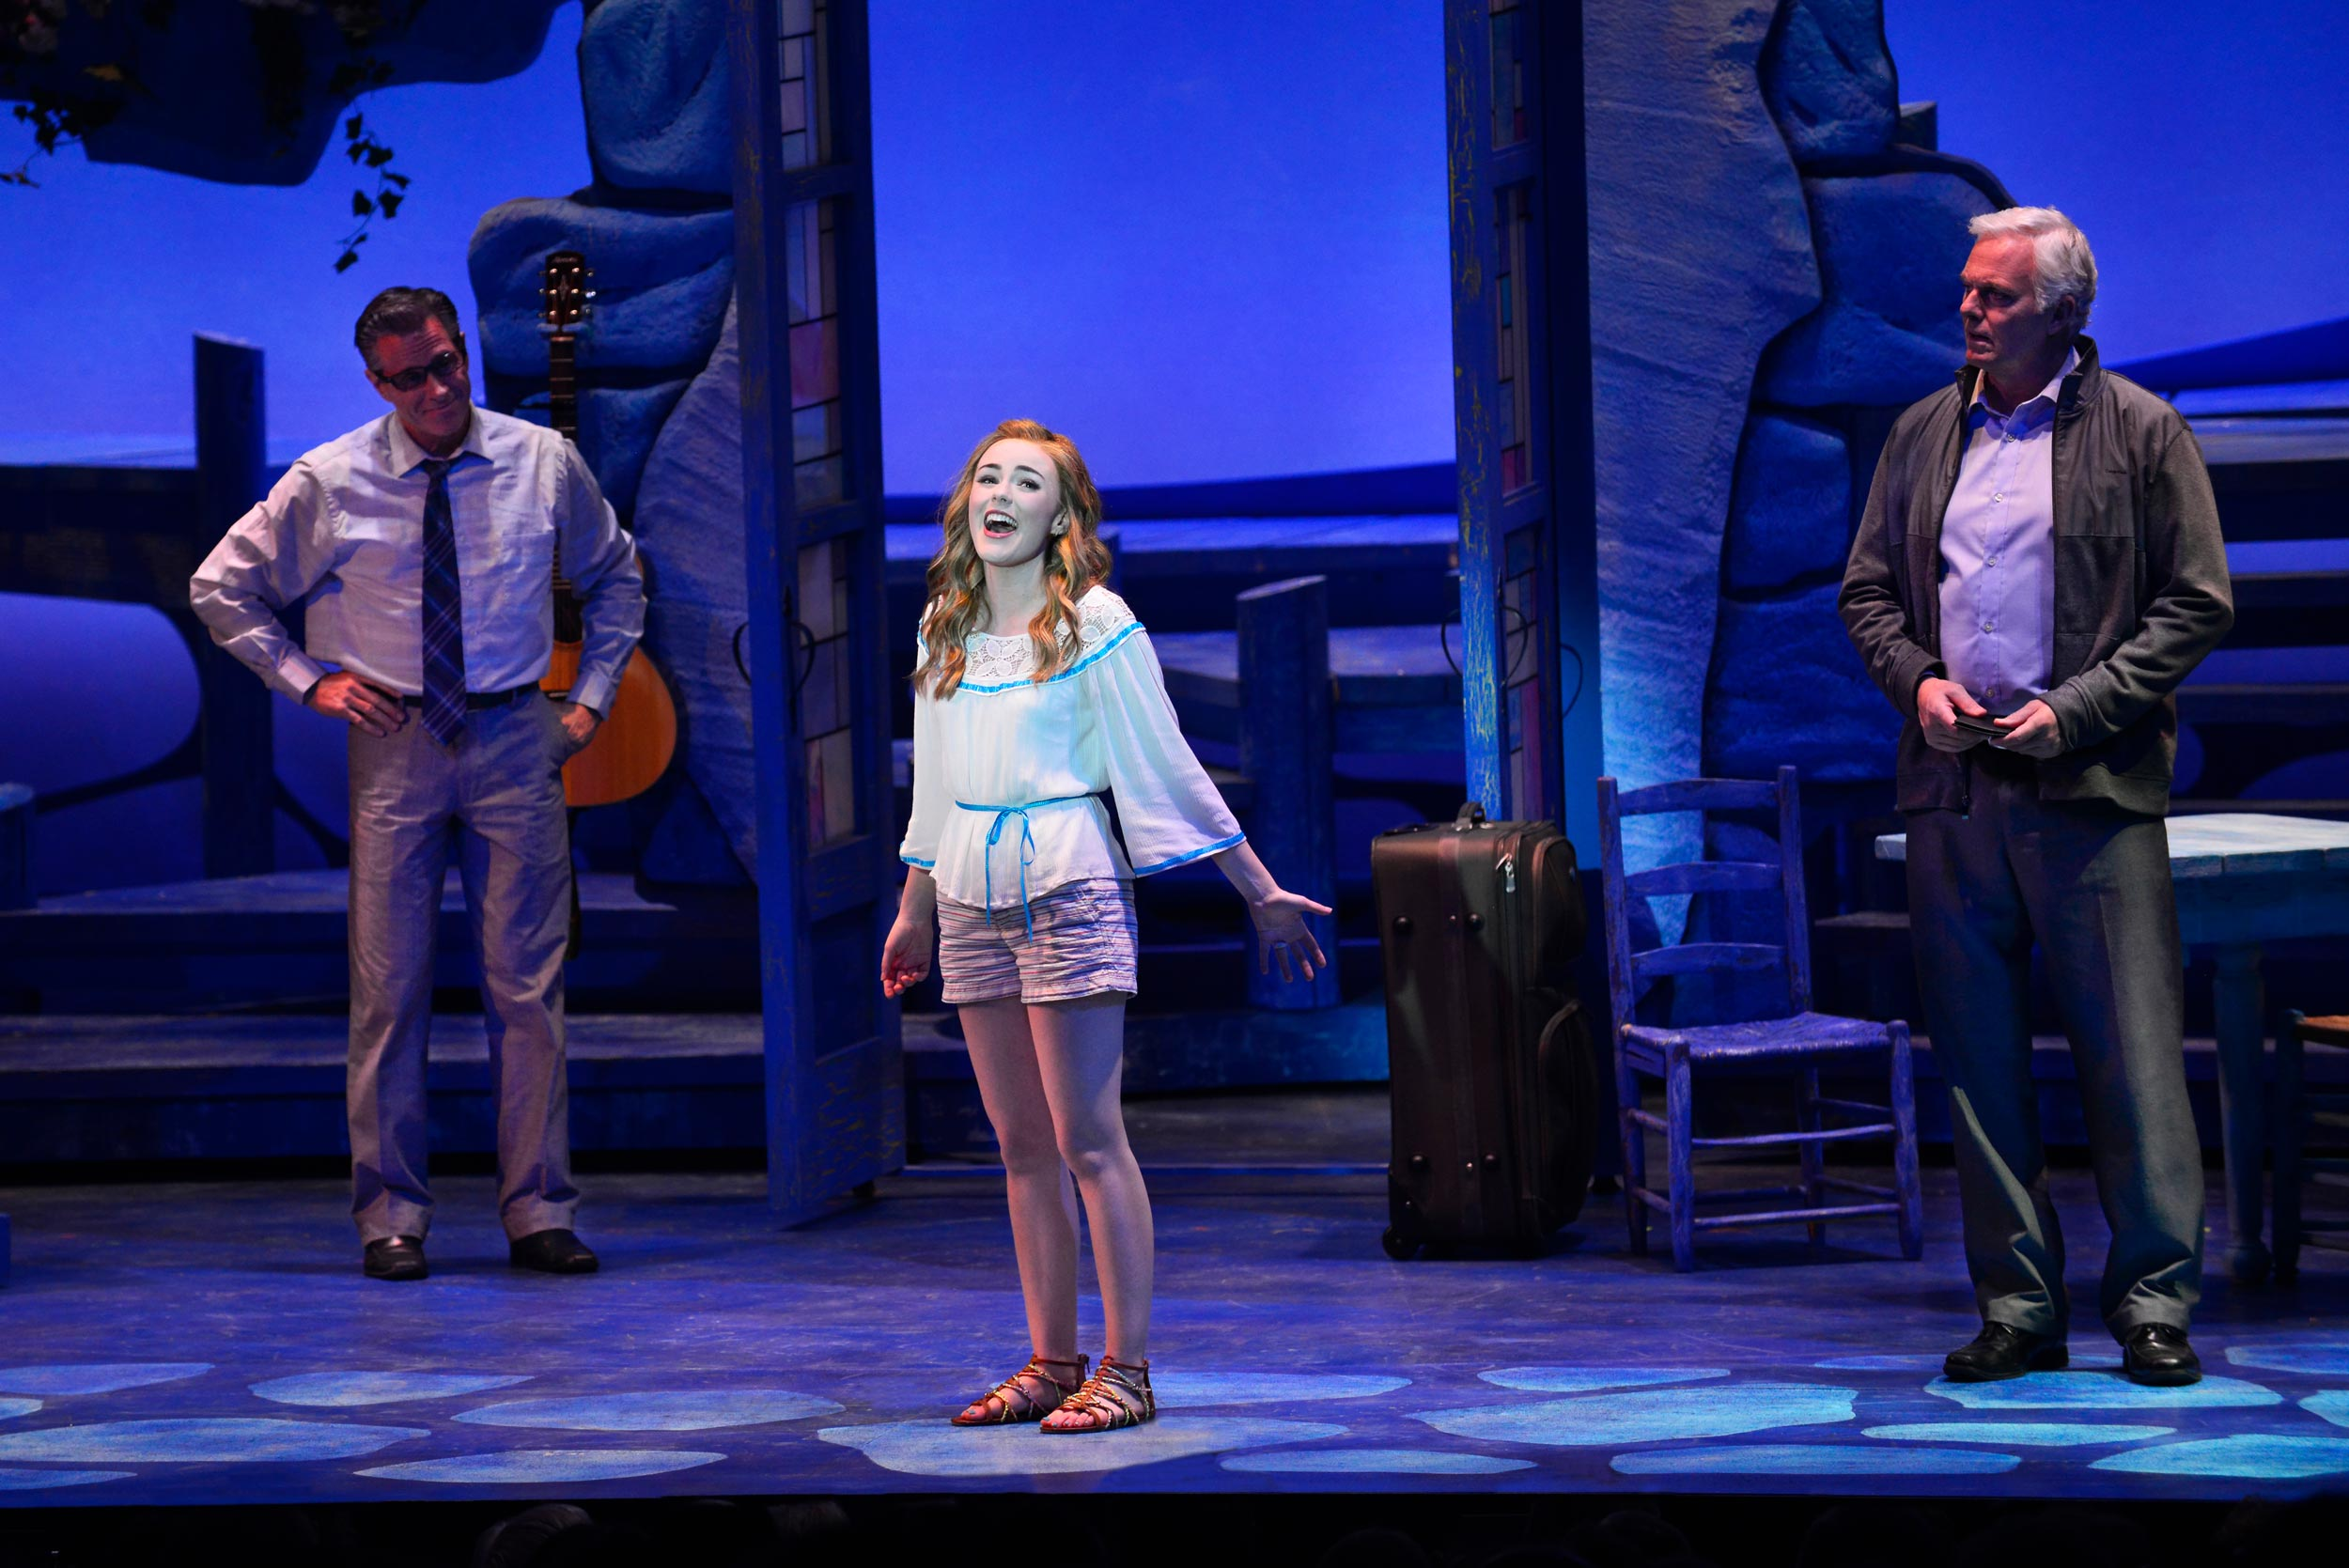 David Engel, Briana Rapa, and Patrick Cassidy in Mamma Mia! at the Ogunquit Playhouse - Photo by Gary Ng